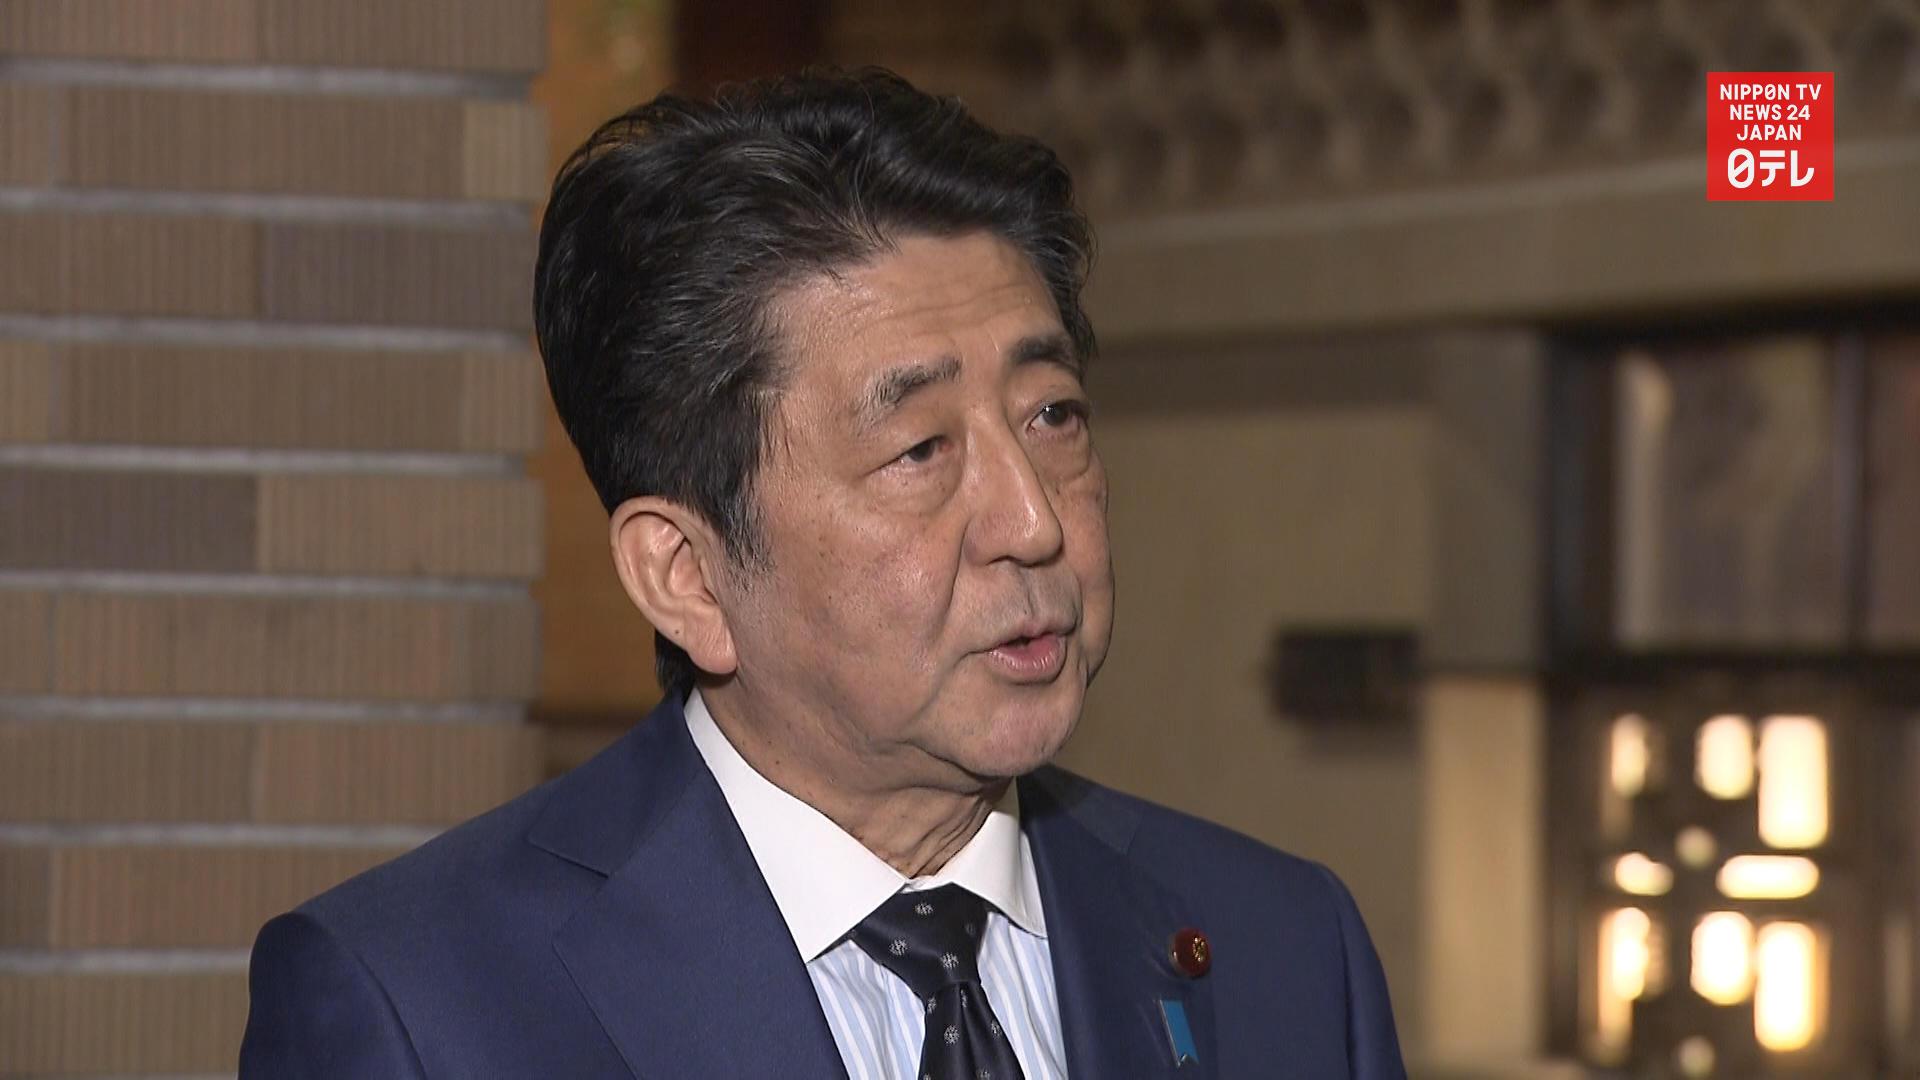 Tokyo Olympics delayed until 2021